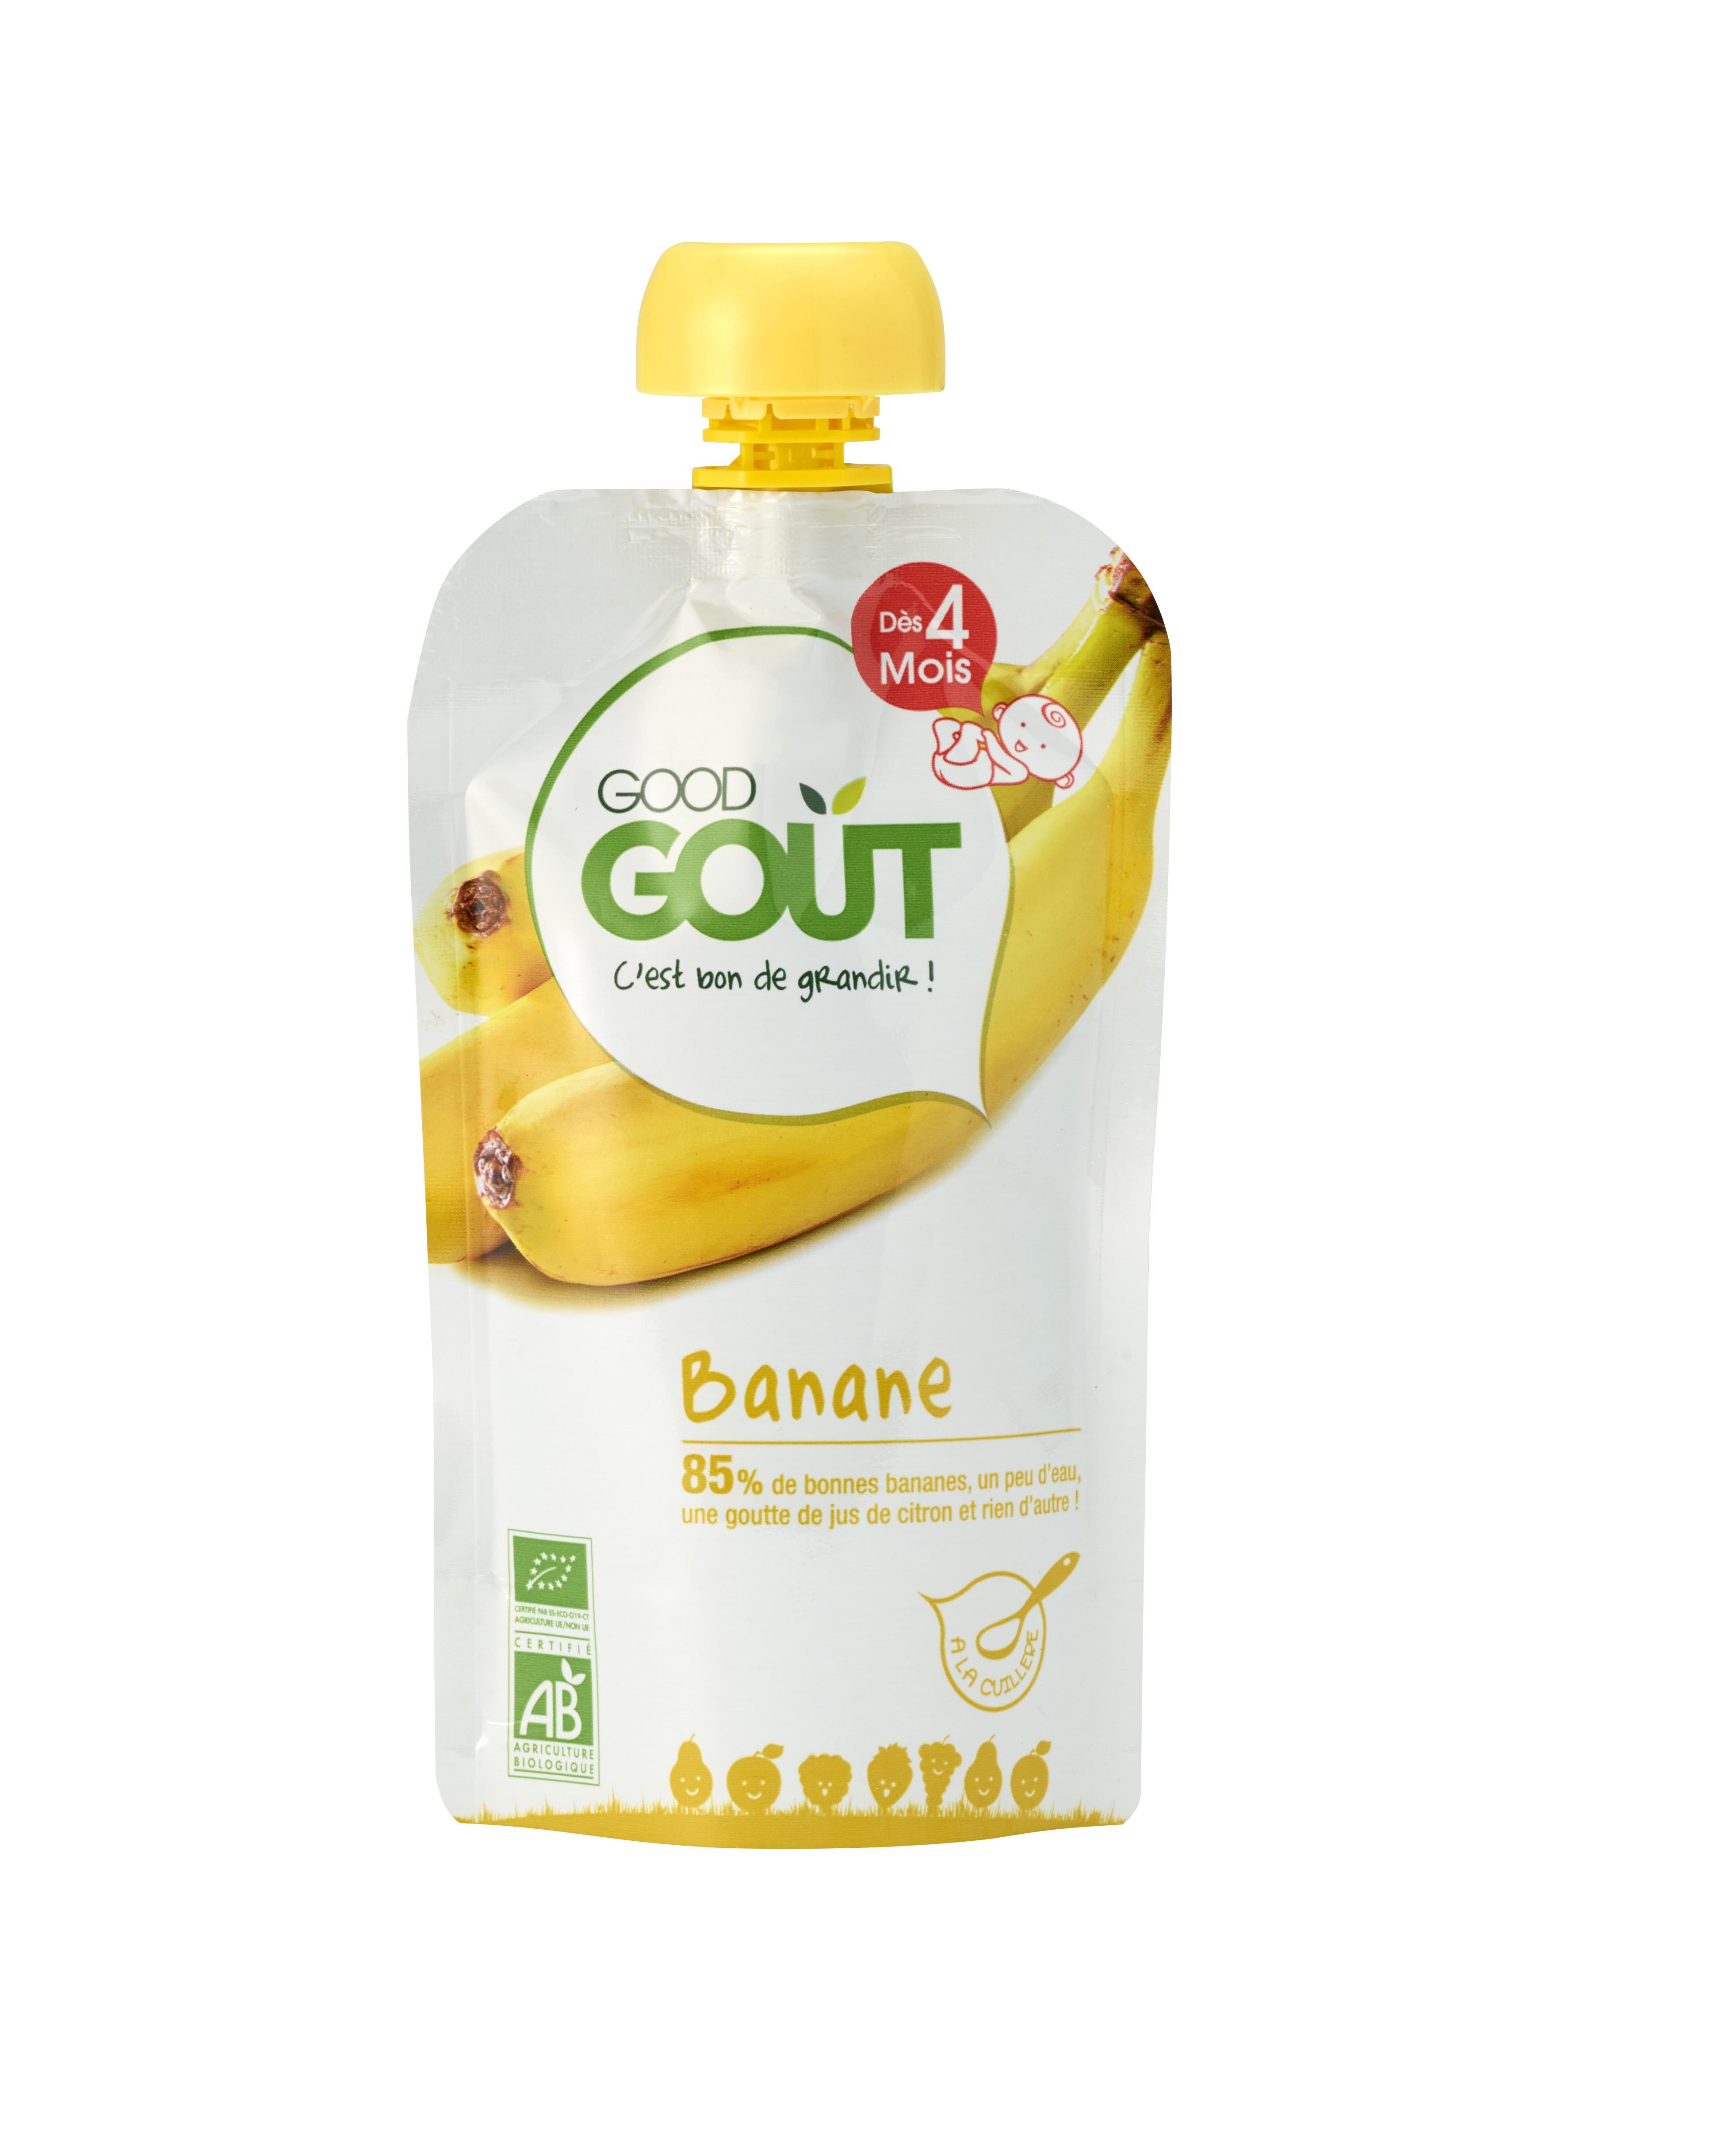 Good Gourde Banane BIO, Good Goût (120 g) - dès 4 mois